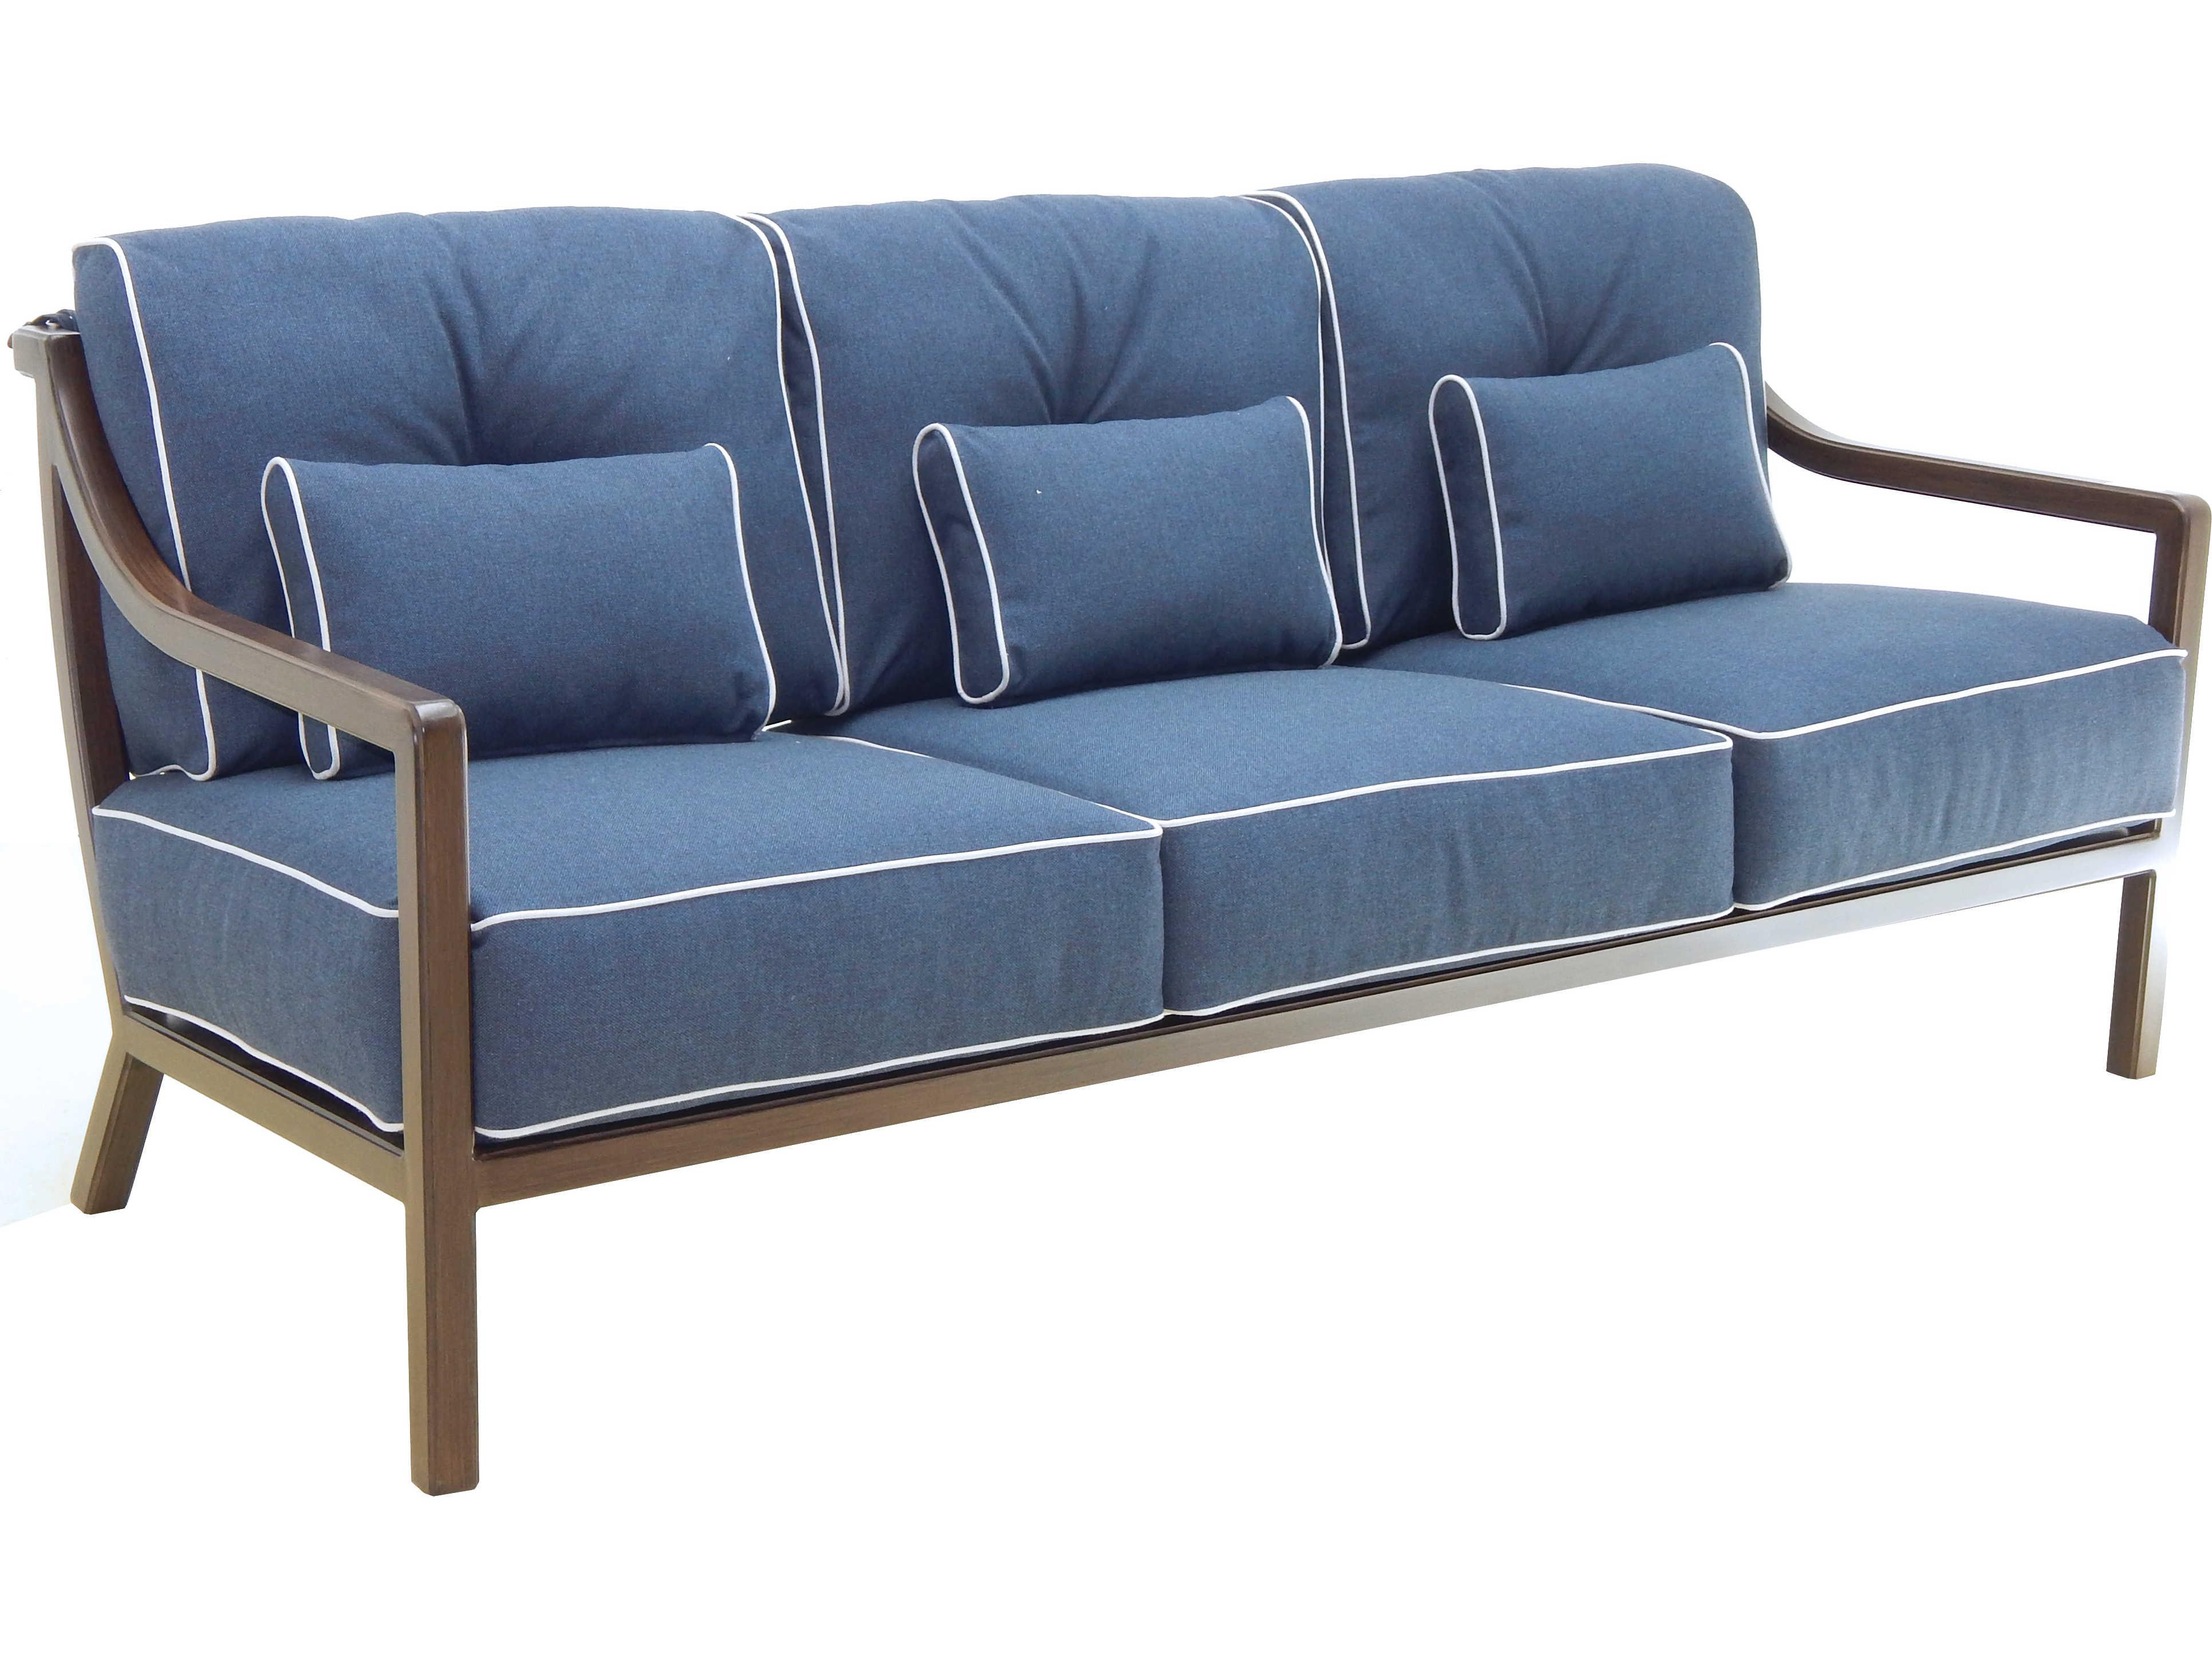 castelle legend deep seating aluminum cushion sofa with three pillows